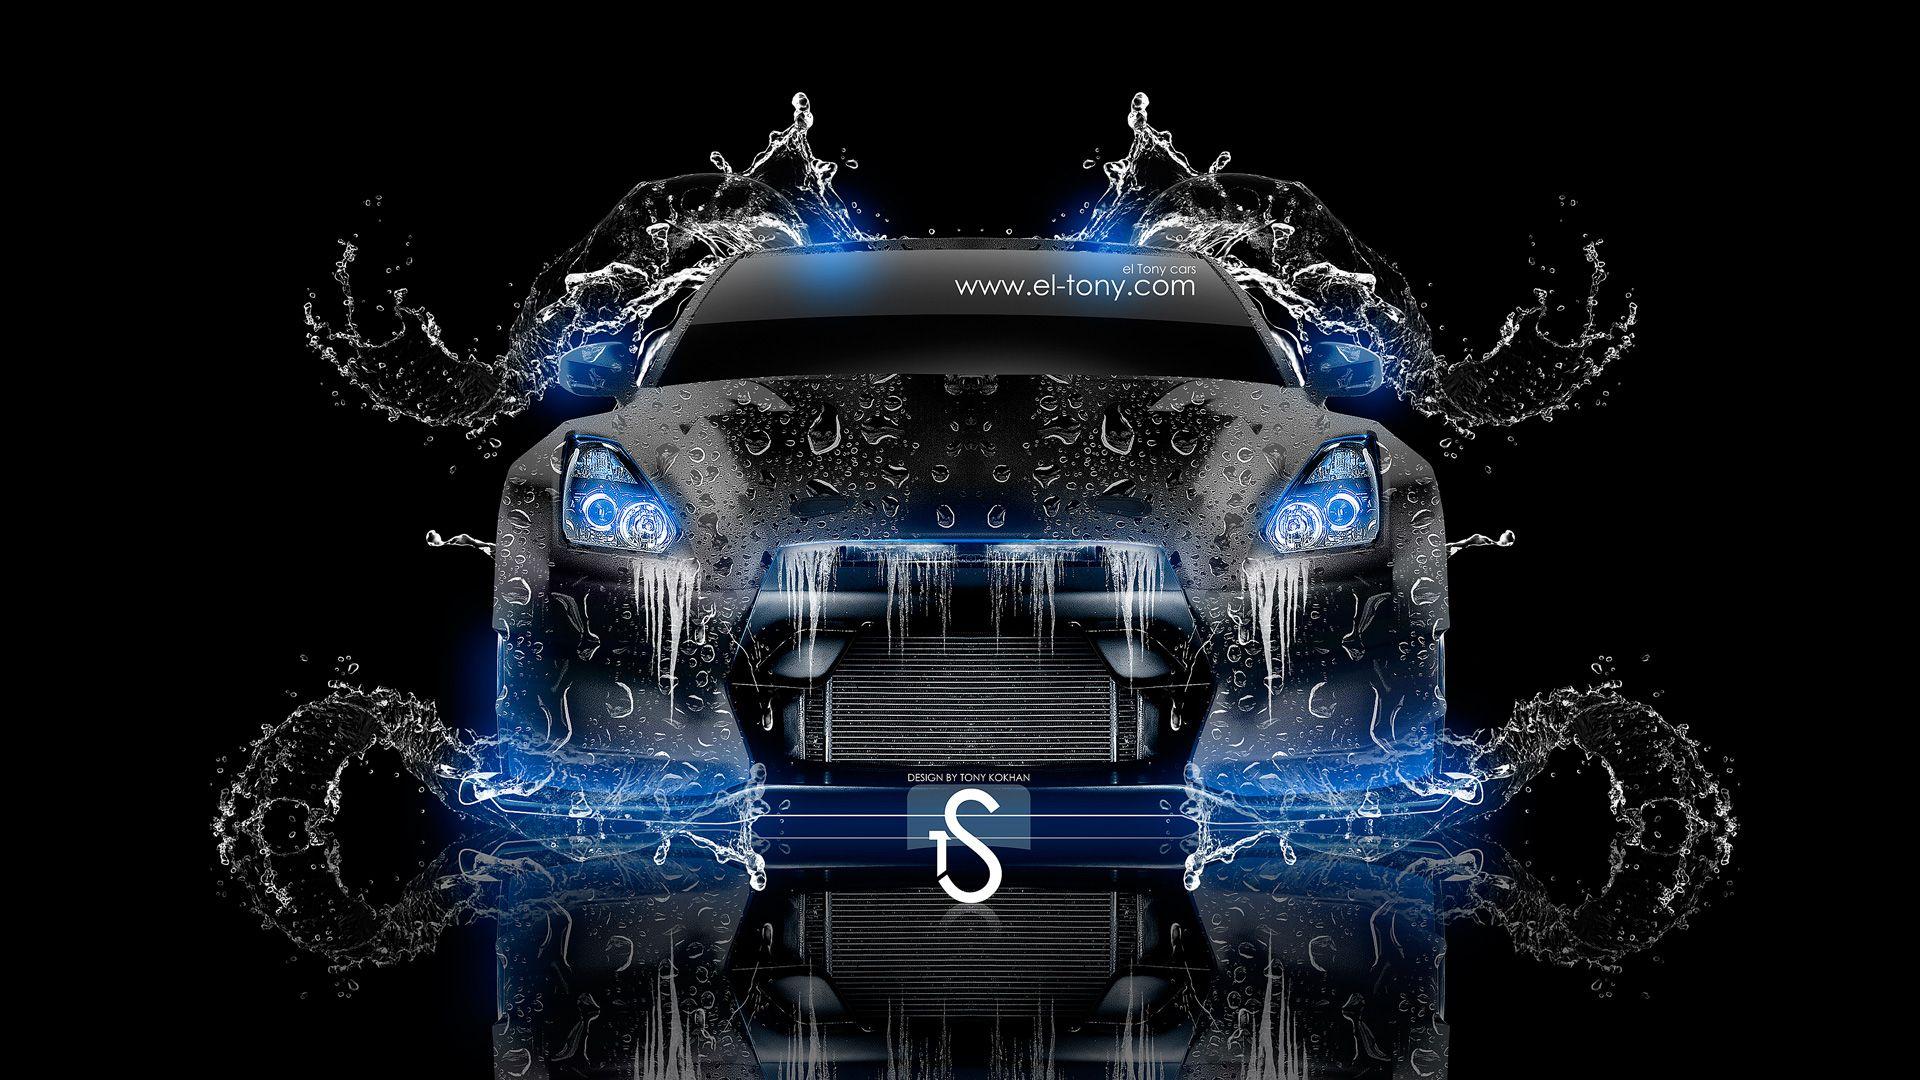 Beau Nissan GTR R35 Front Water Tuning Car 2013 « El Tony